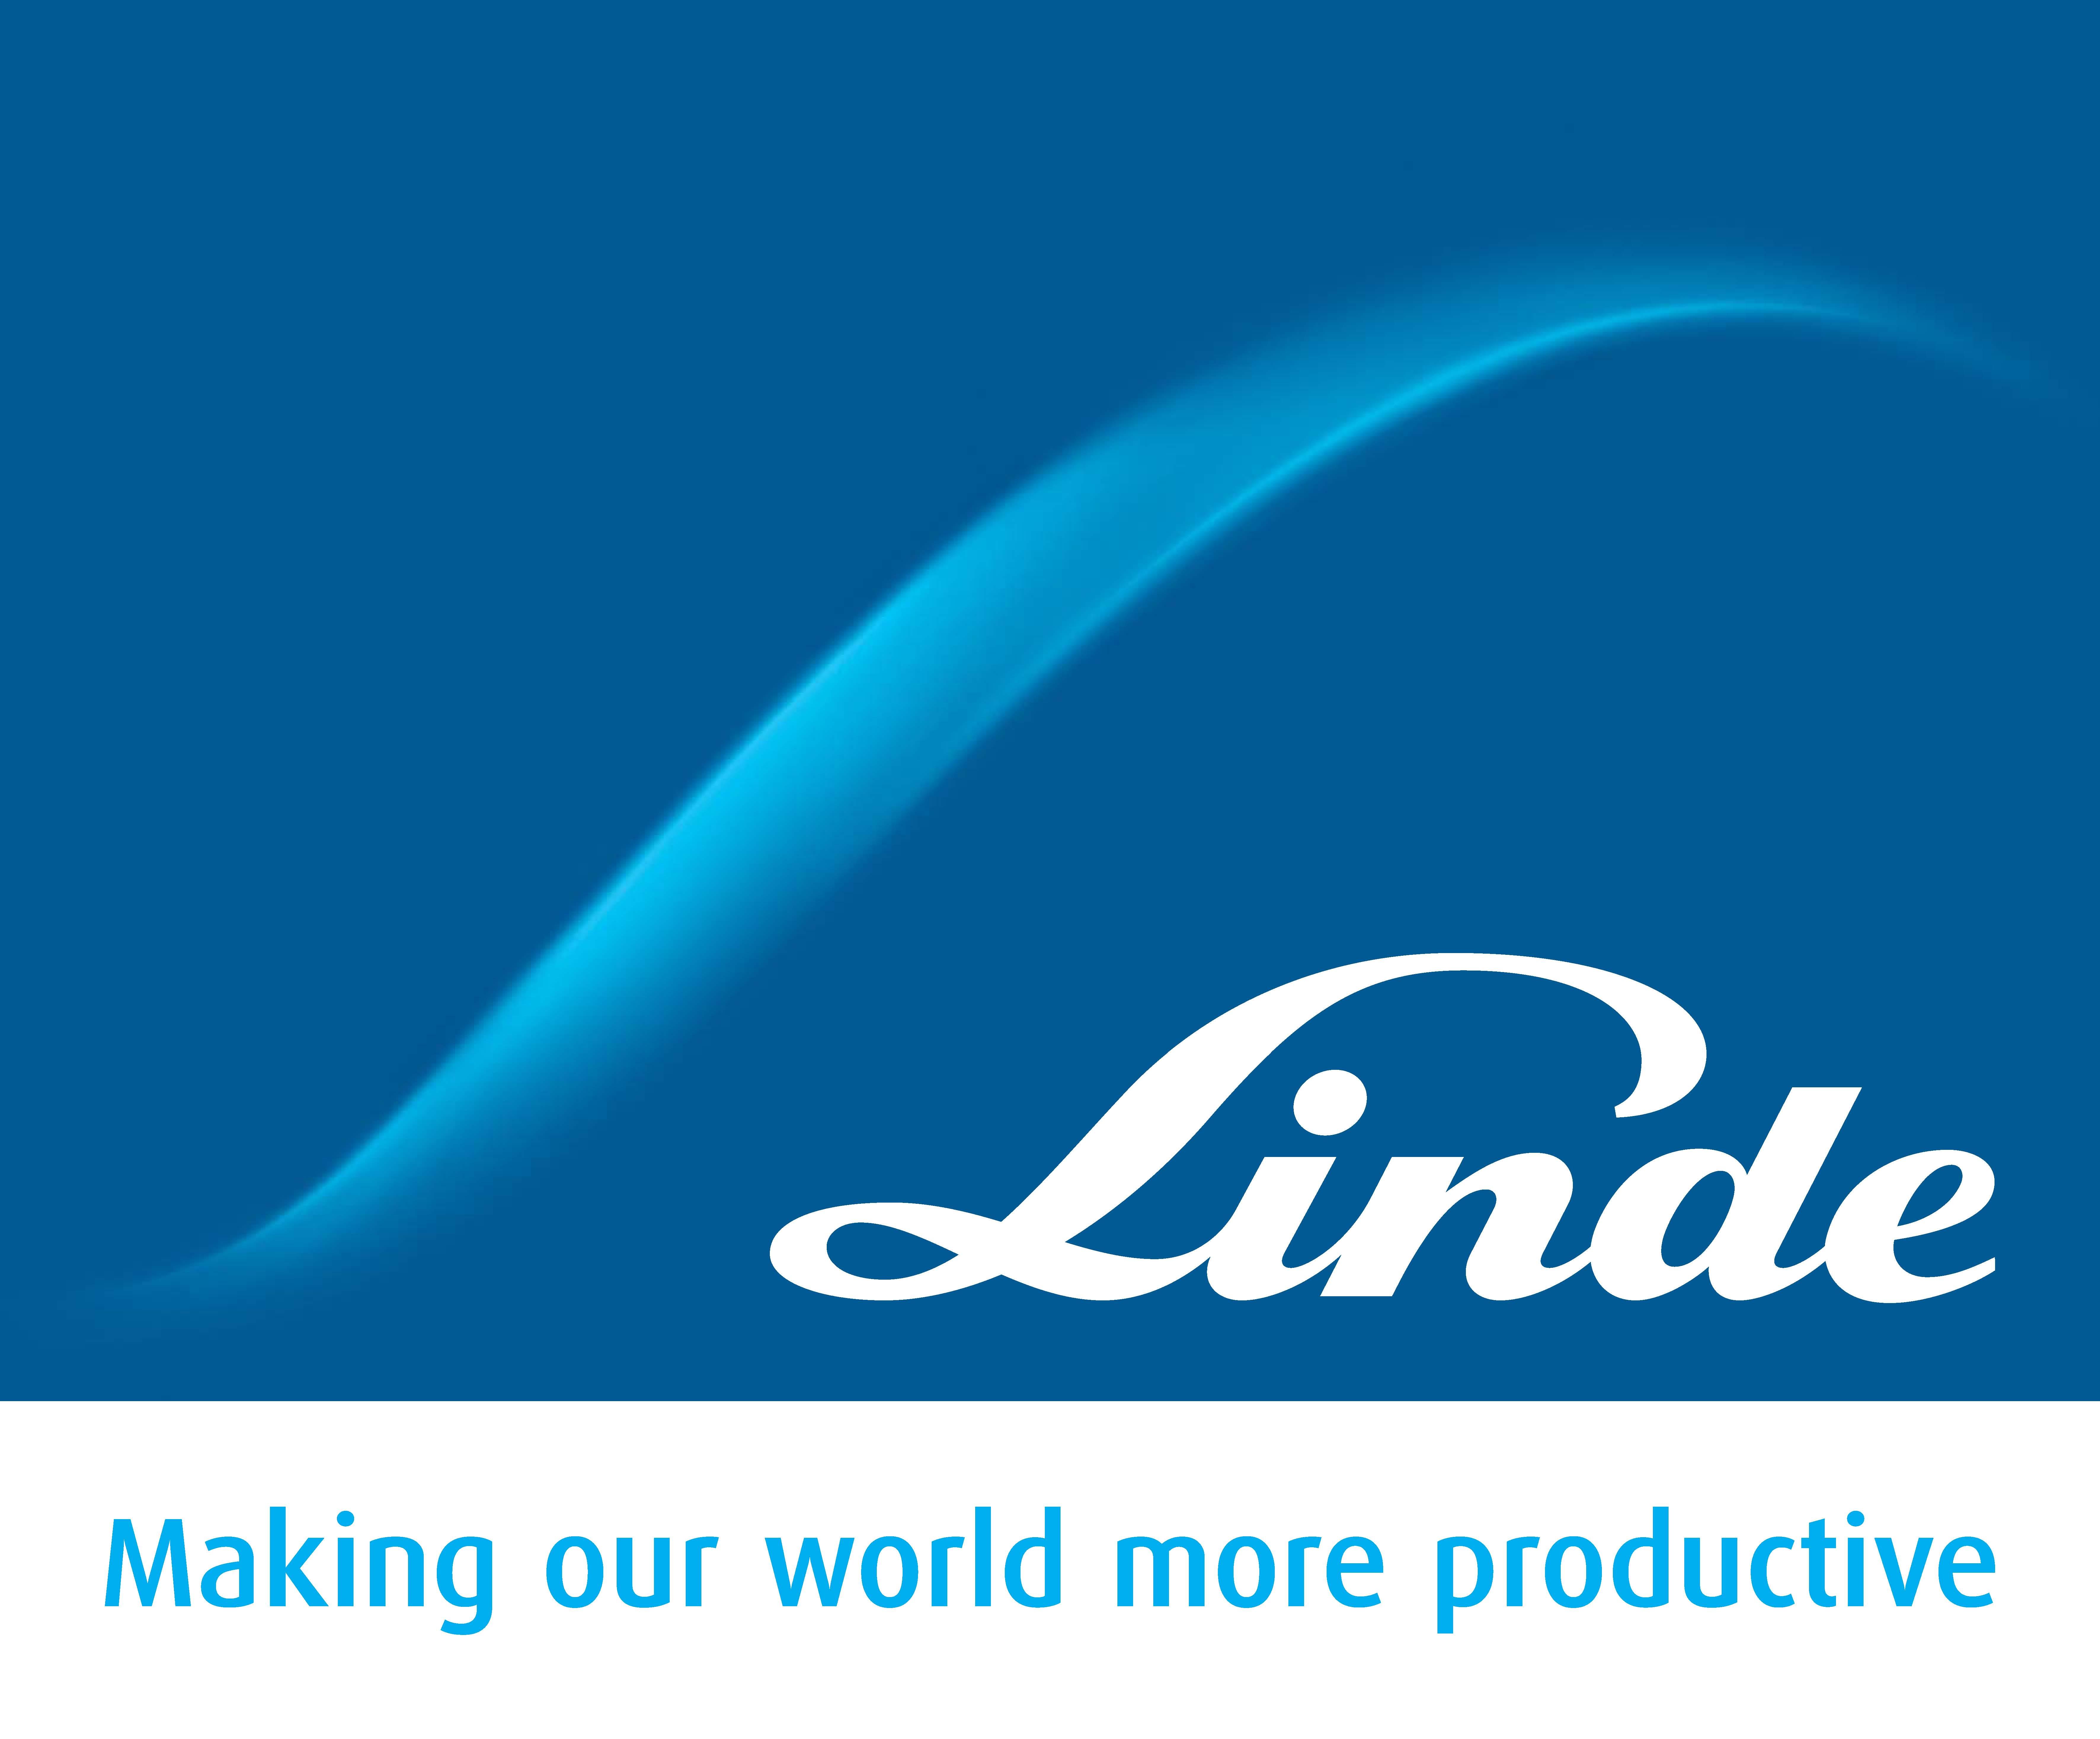 Linde_plc_logo_combi_cyan_2_1_CMYK_IsoCV2